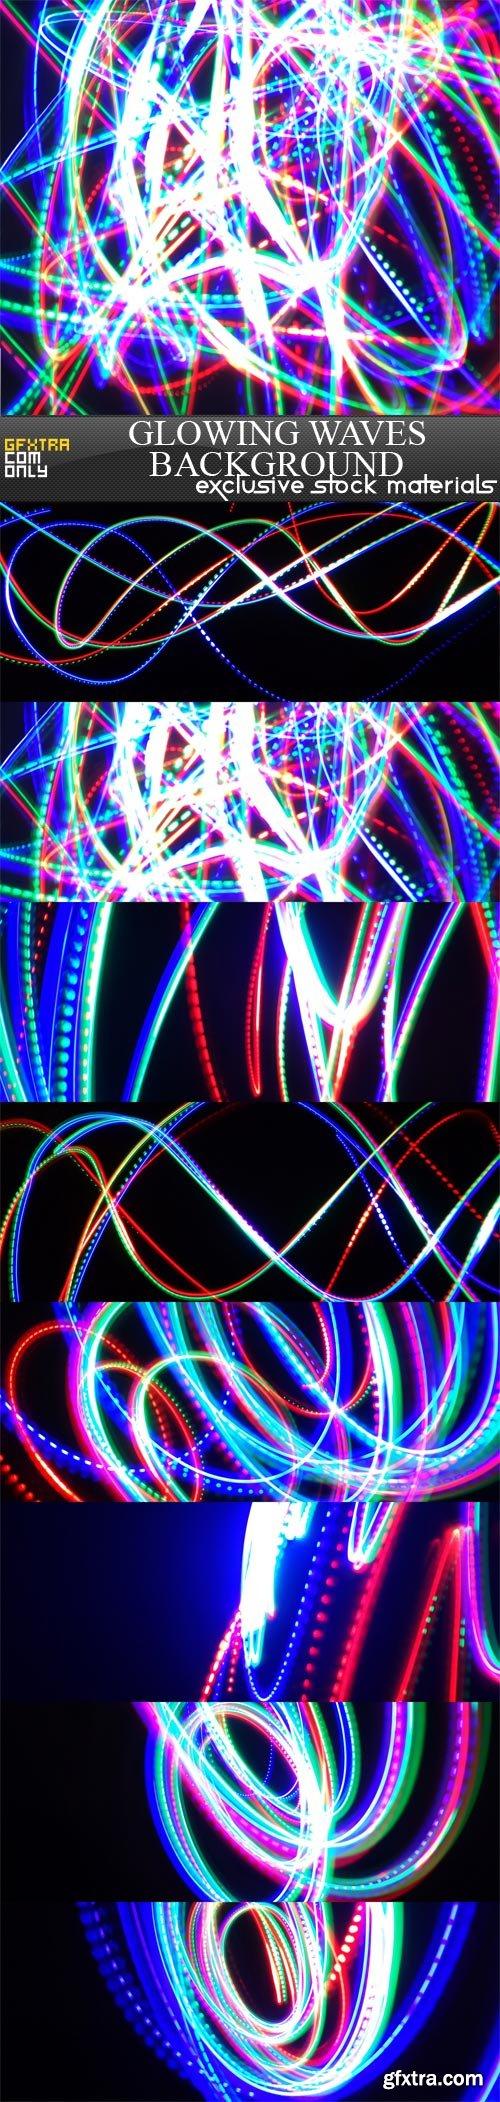 Glowing waves background, 8 UHQ JPEG